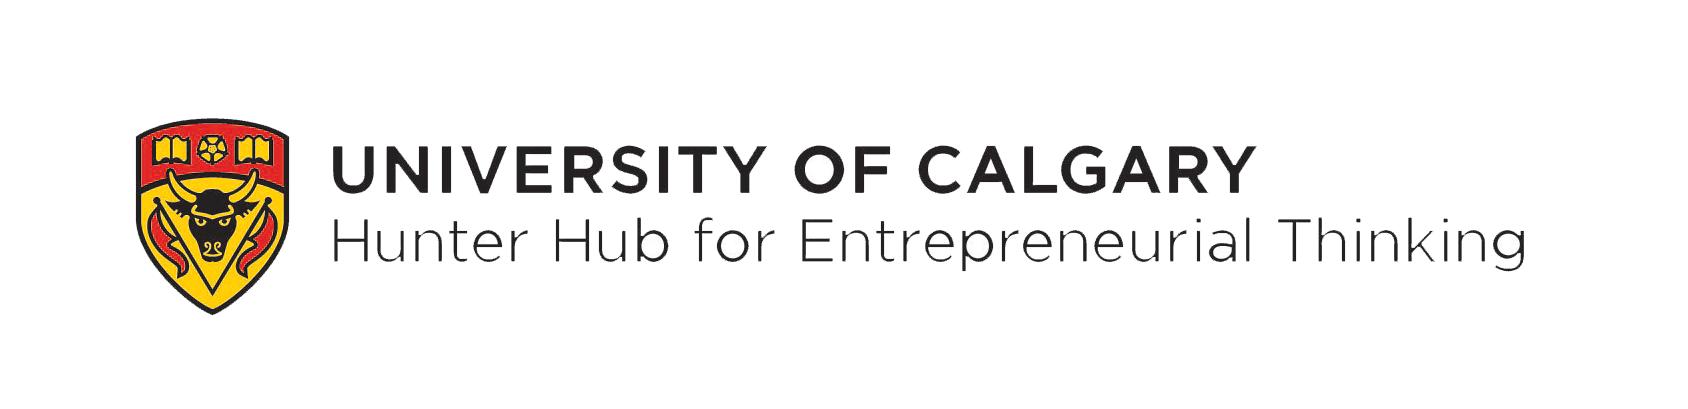 UC-Hunter Hub for Entrepreneurial Thinking-lockup_sized.png